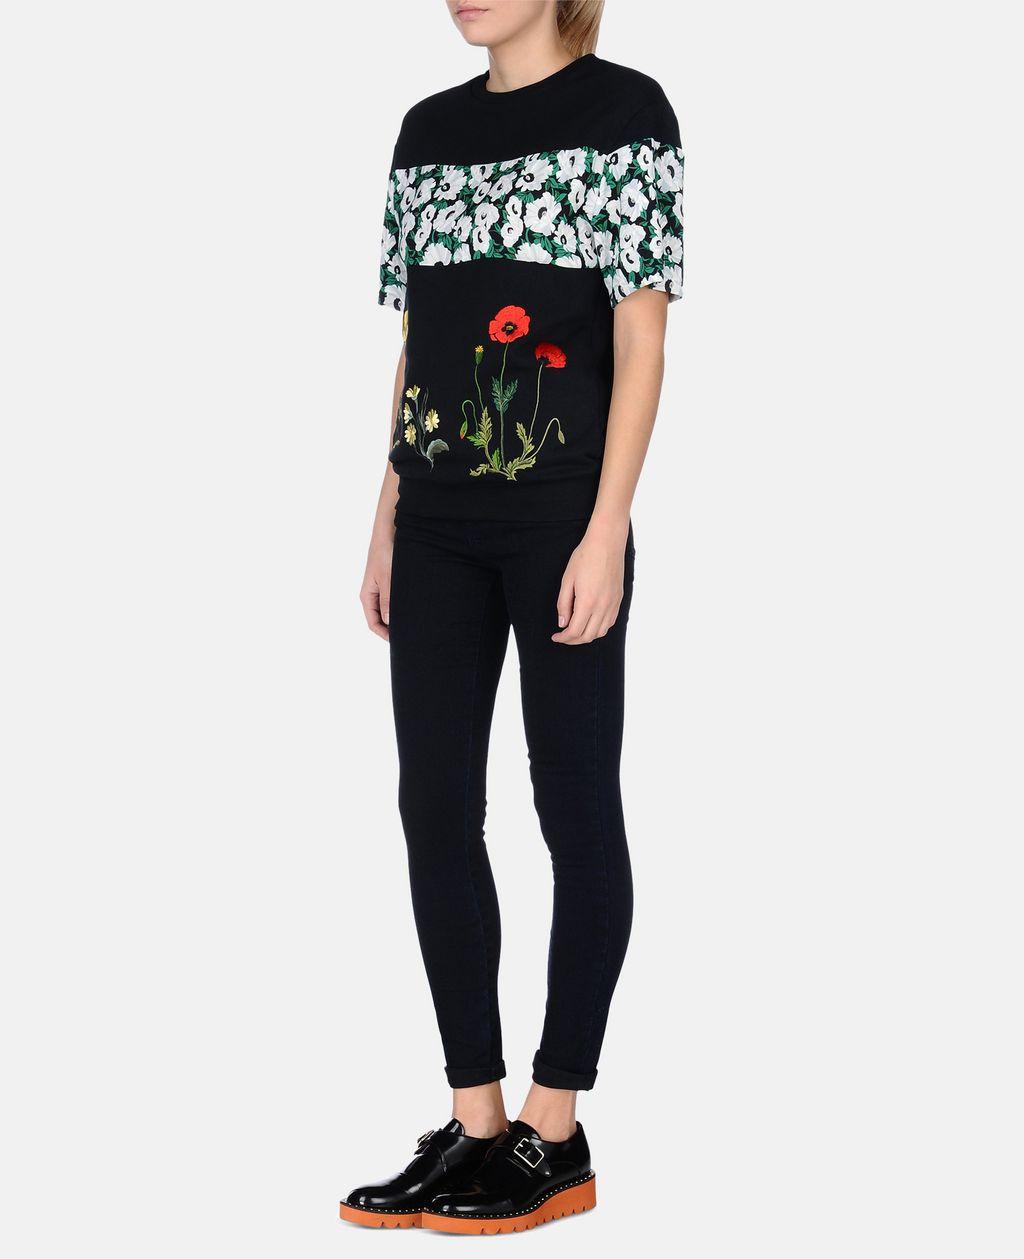 High waisted Skinny Jeans - STELLA MCCARTNEY